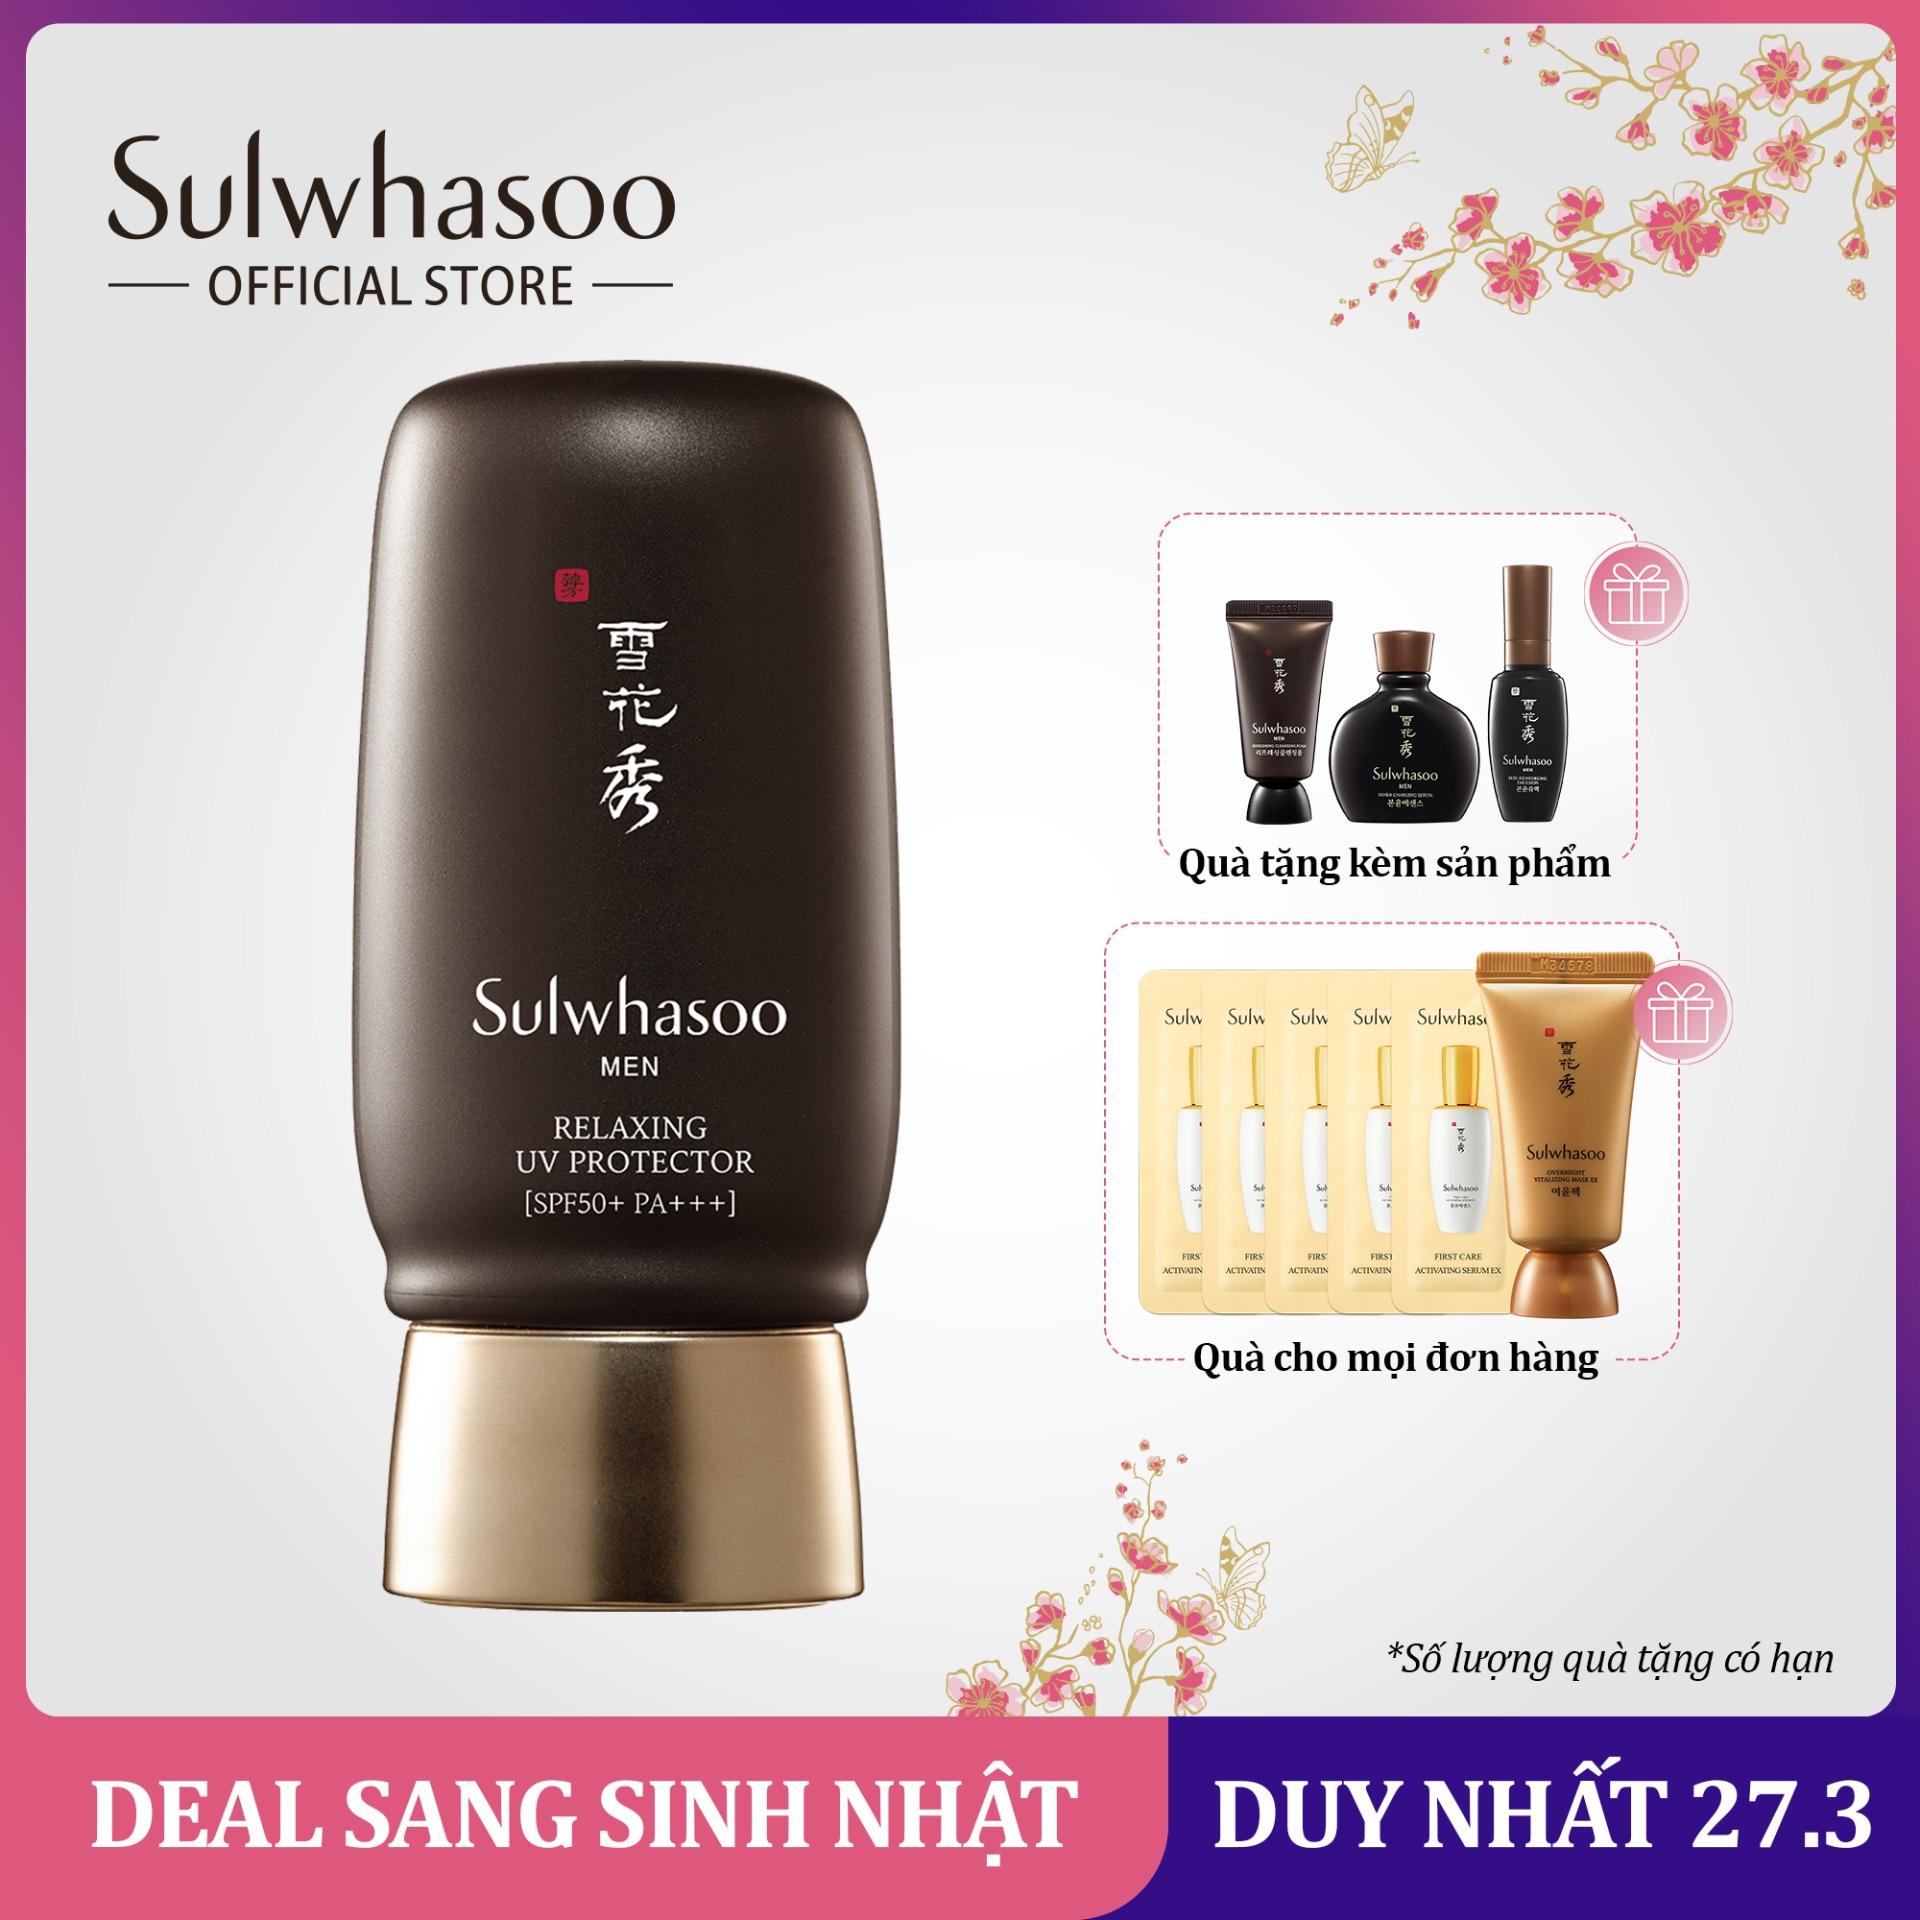 Kem chống nắng cho nam Sulwhasoo Relaxing Uv Protector 50ml cao cấp